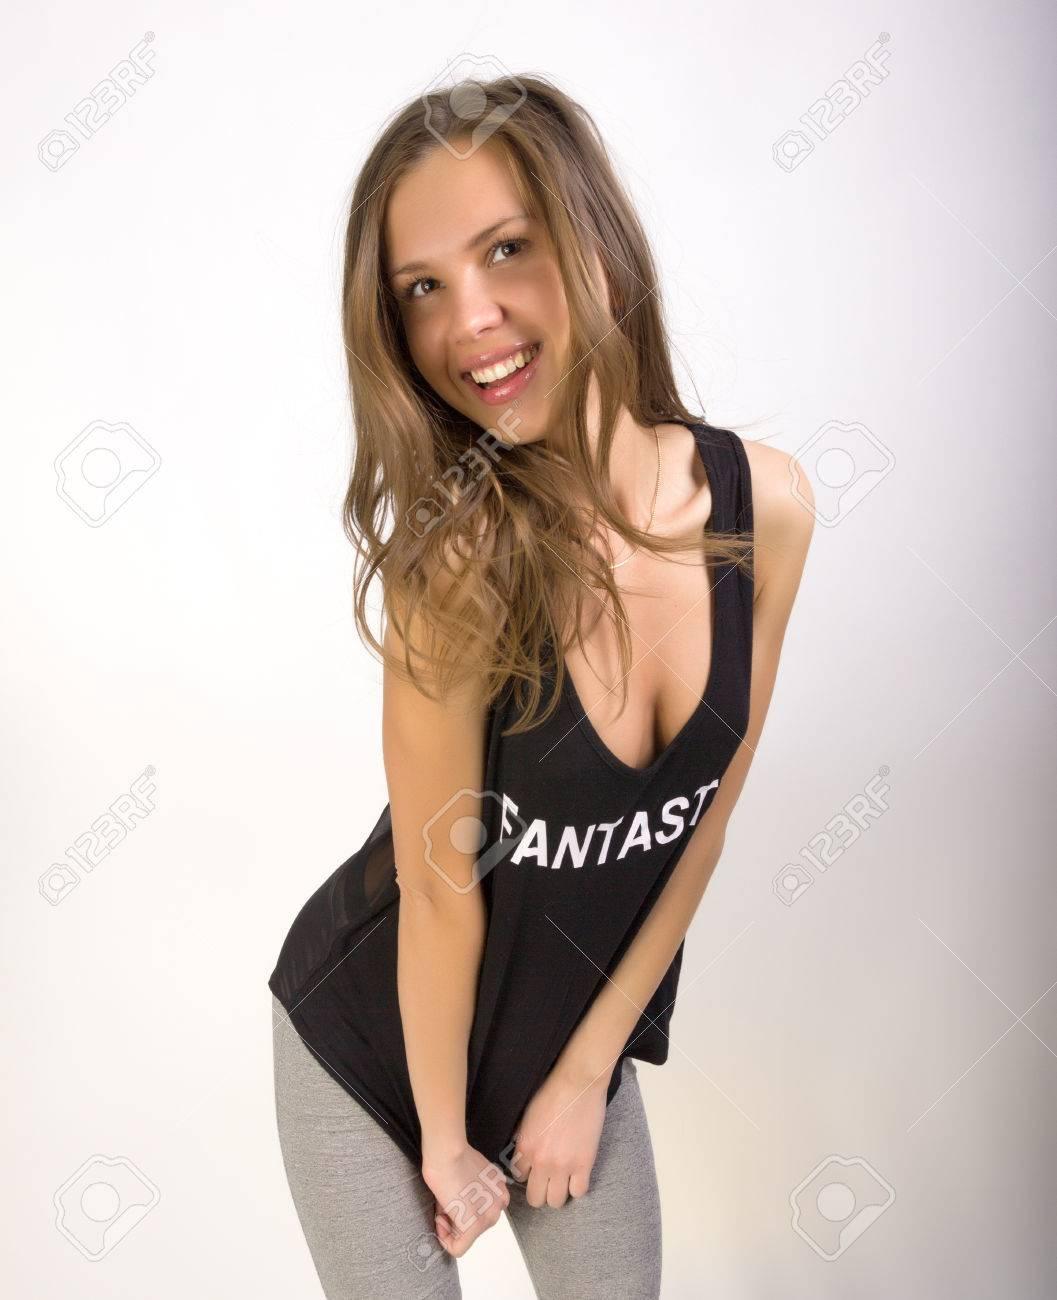 sexy schwarze Mädchen-Shoirt Lesben verführen Röhren